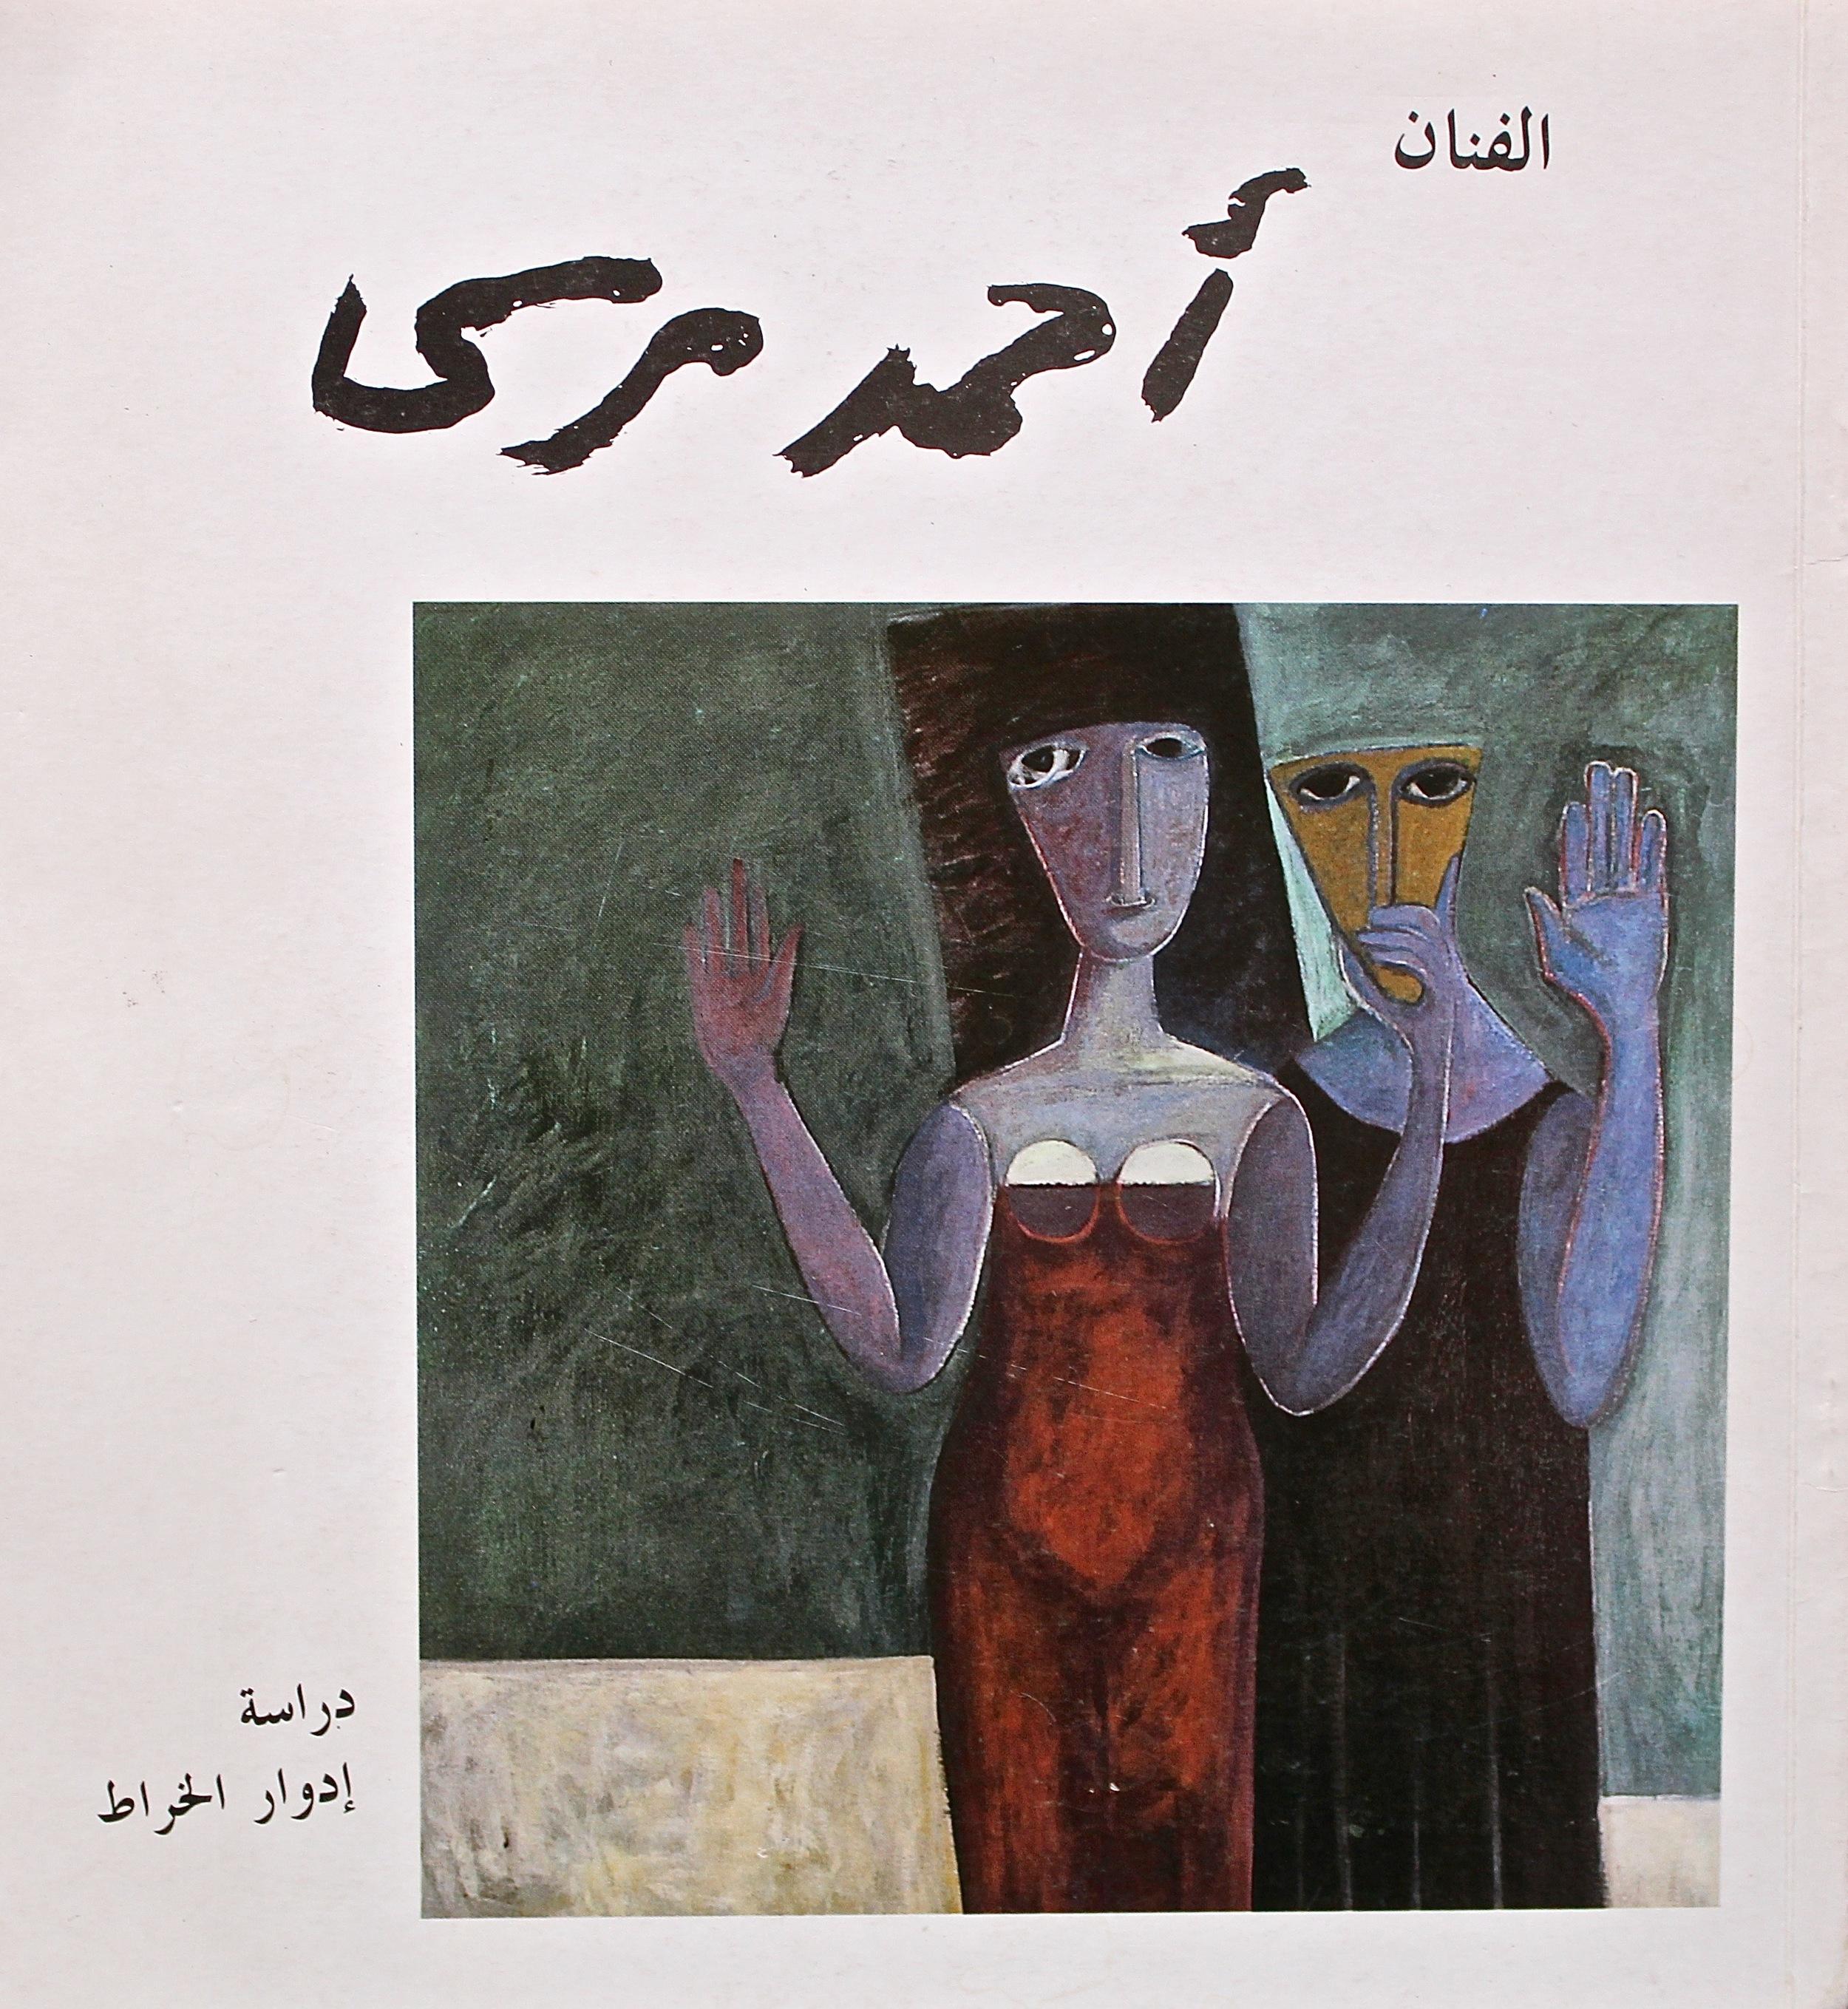 Introduction by Edwar El Kharrat